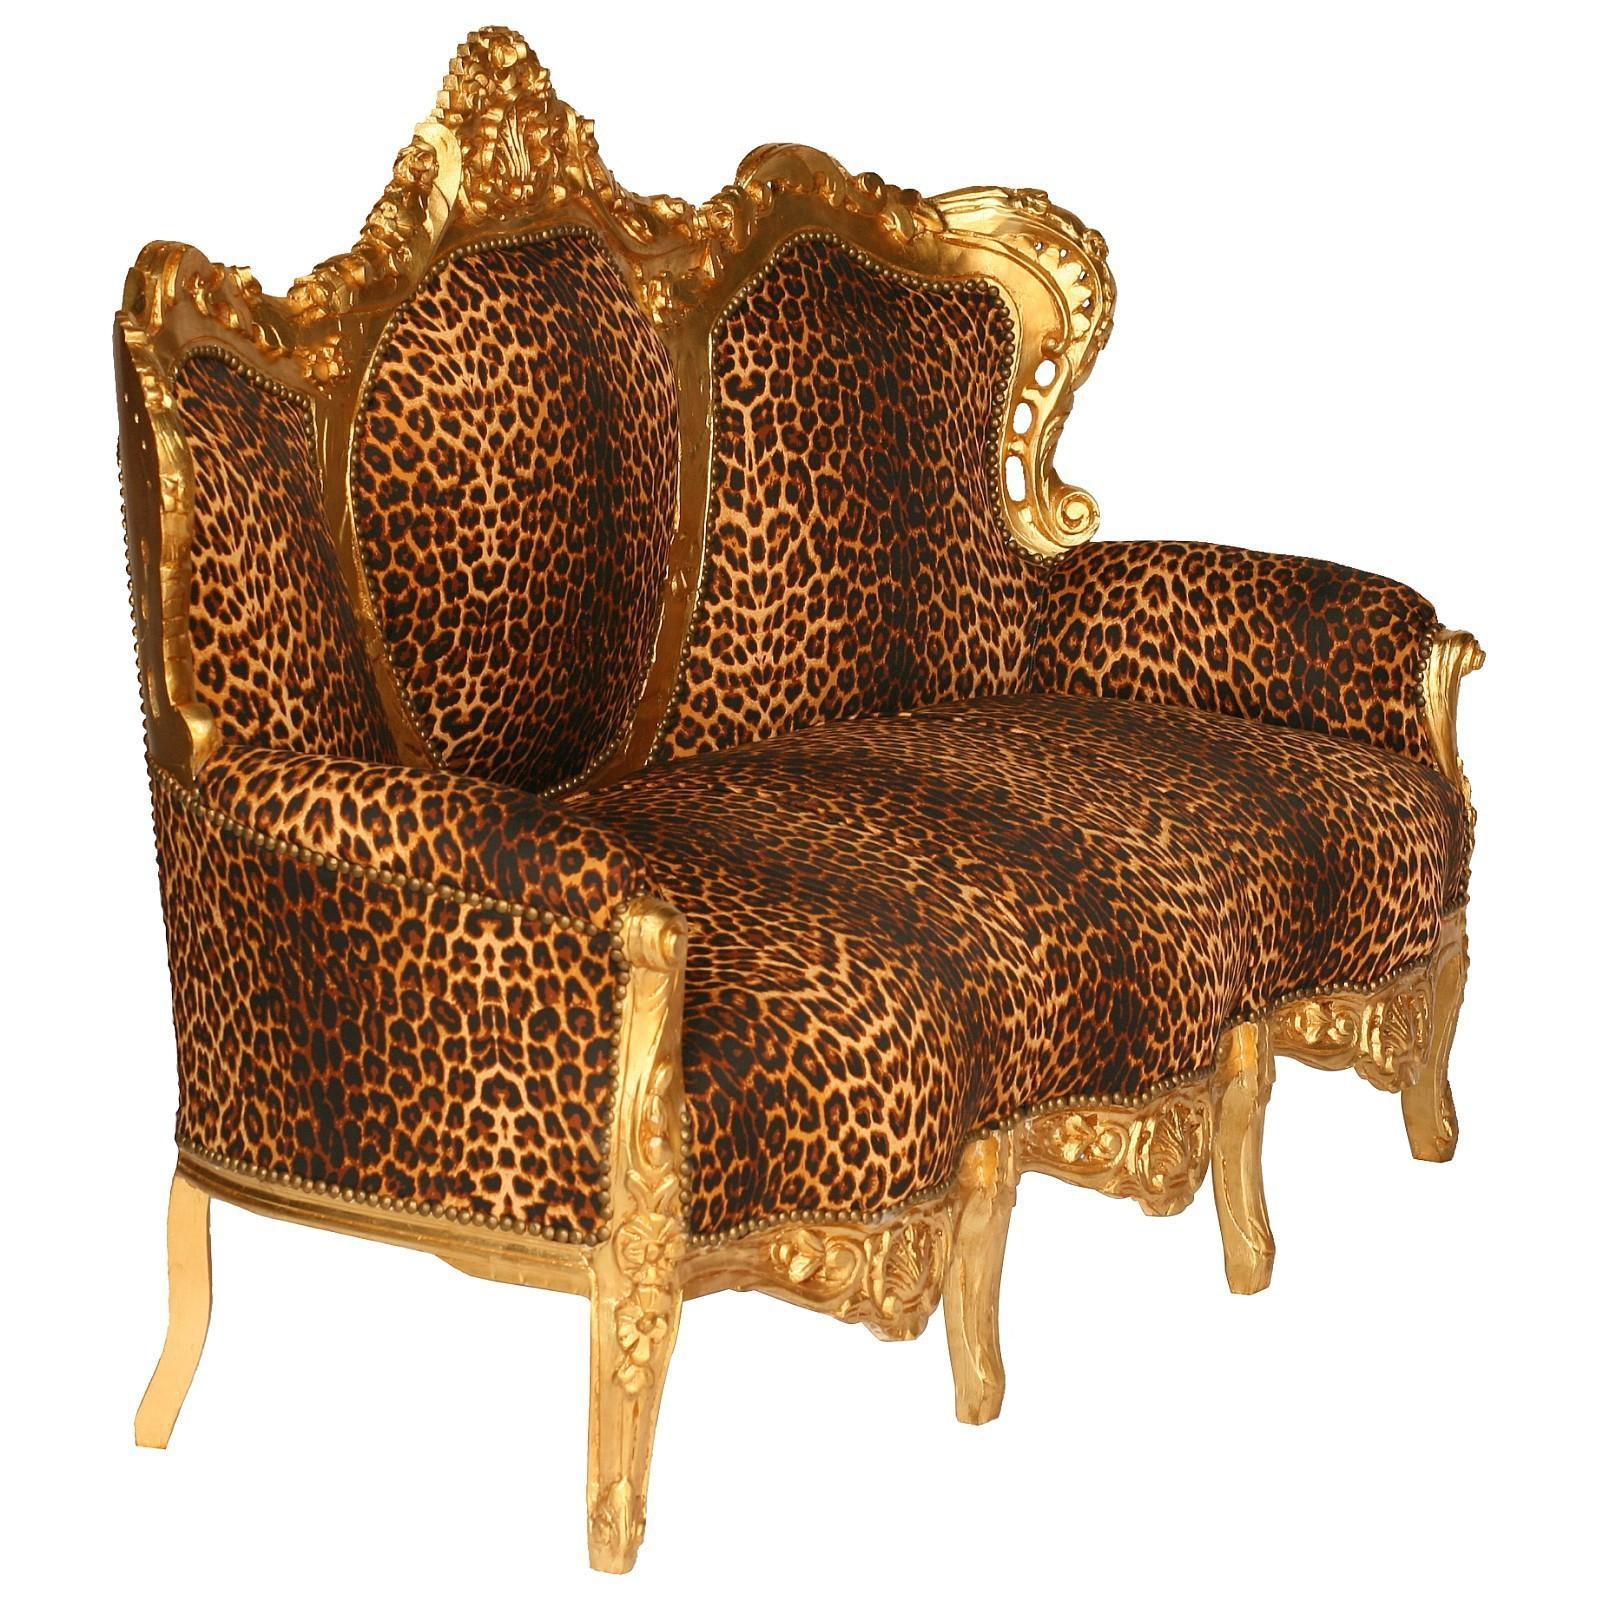 Sofas Center : Animal Print Cushions On Black Armchairs And Sofa With Regard To Animal Print Sofas (Image 16 of 20)